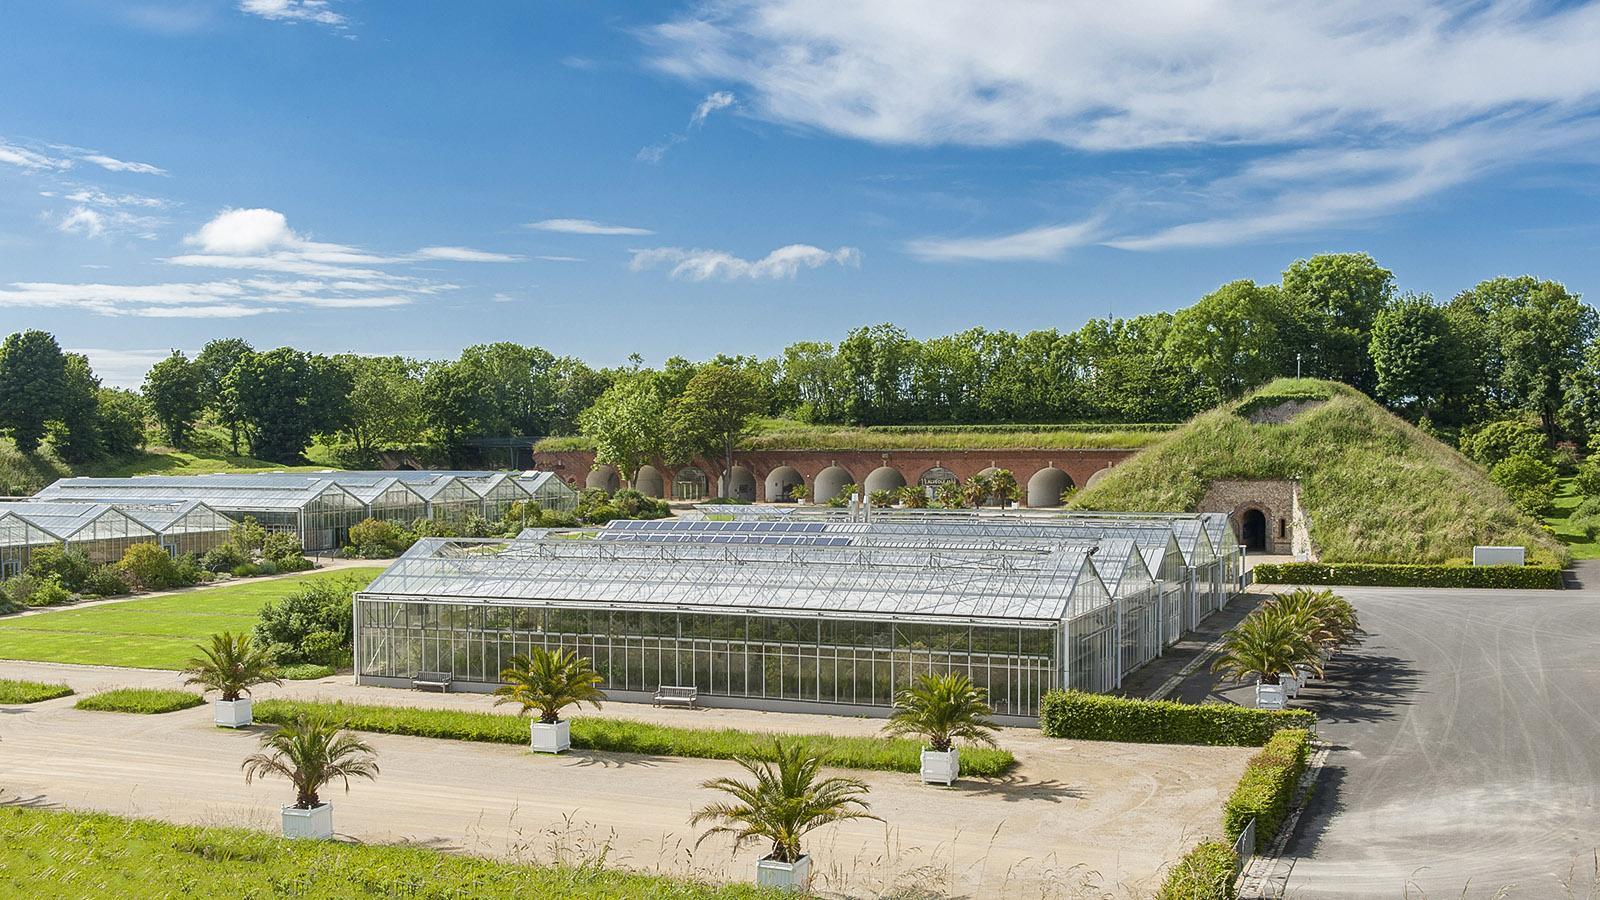 Le Havre: Les Jardins Suspendus. Foto: Hilke Maunder